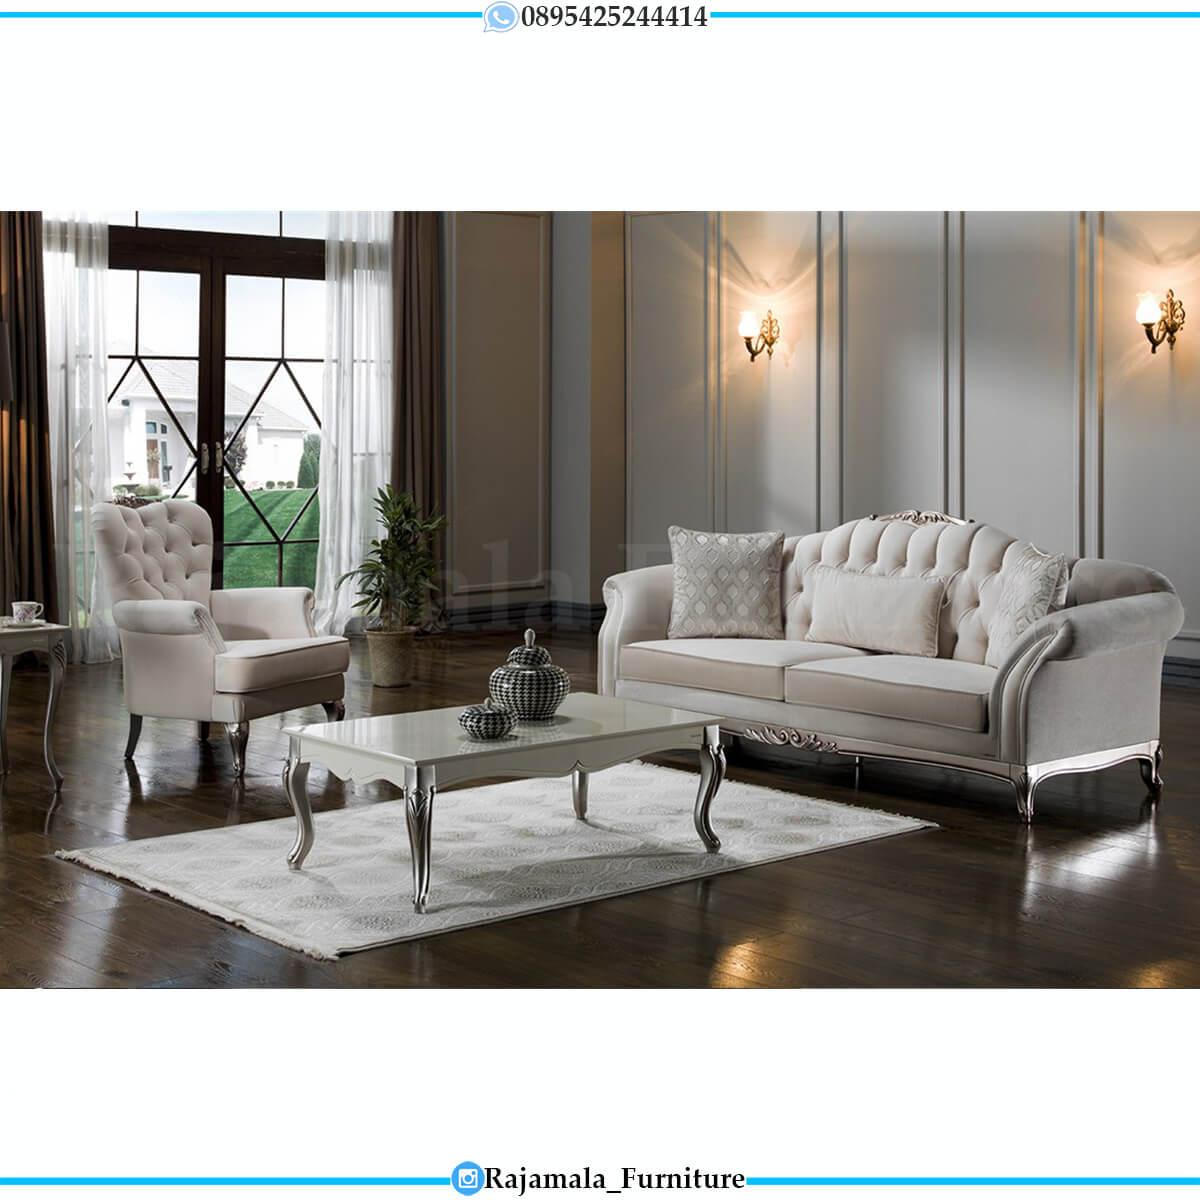 Sofa Tamu Minimalis Mewah Silver Shadow Classic Color Art Duco RM-0622